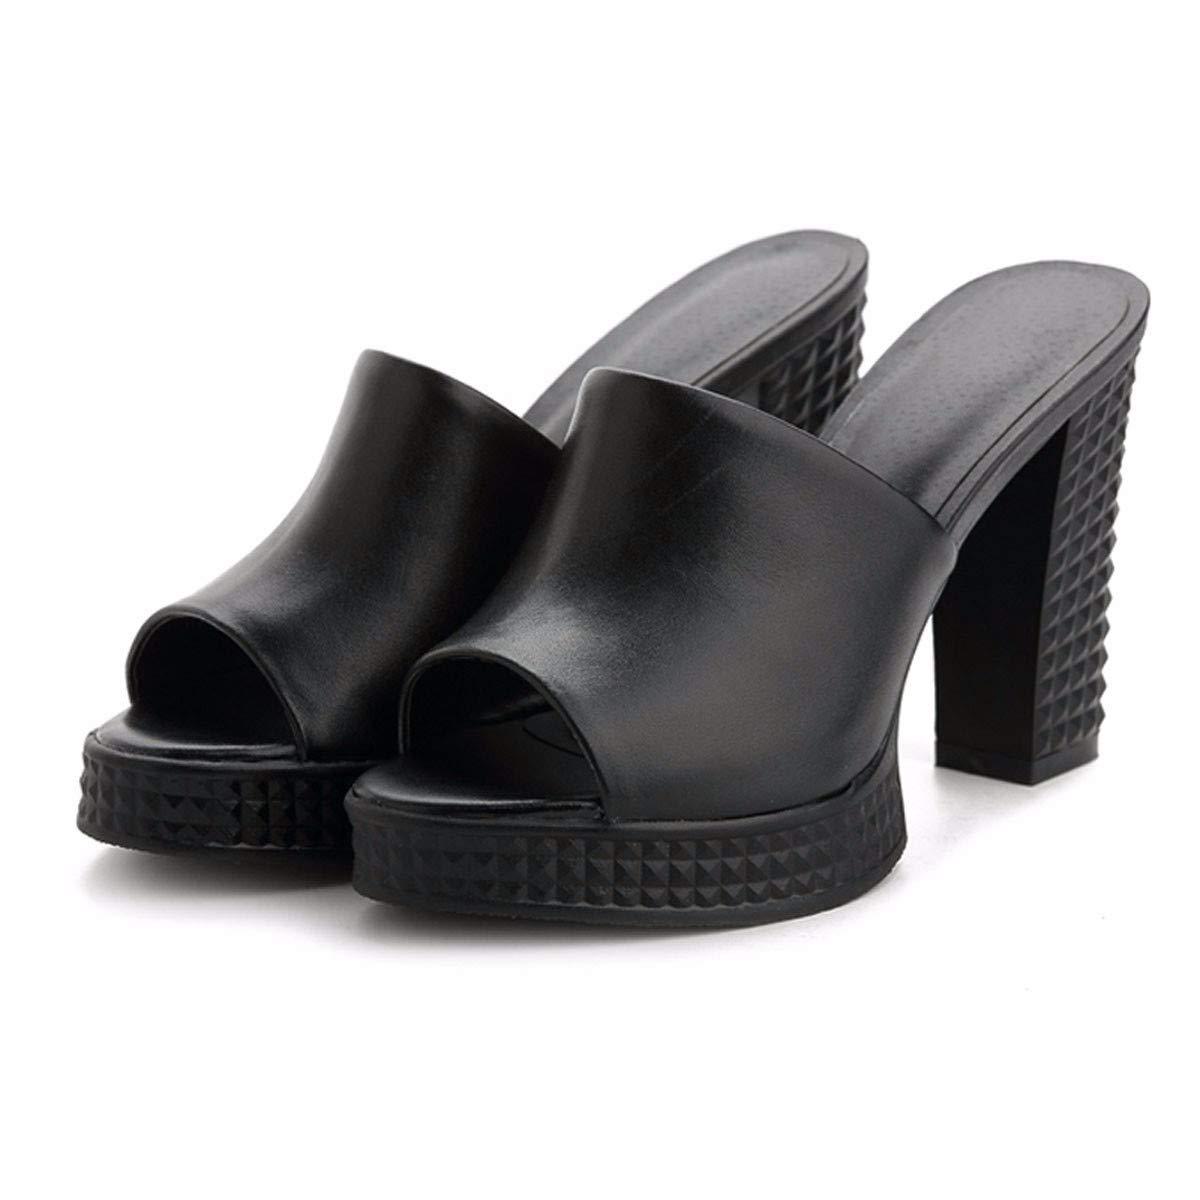 KPHY Damenschuhe/Leder Rau und Pantoffeln Sommer Mode Tragen 11Cm High Heels Damenmode Drag Passende Schuhe.38 Schwarz